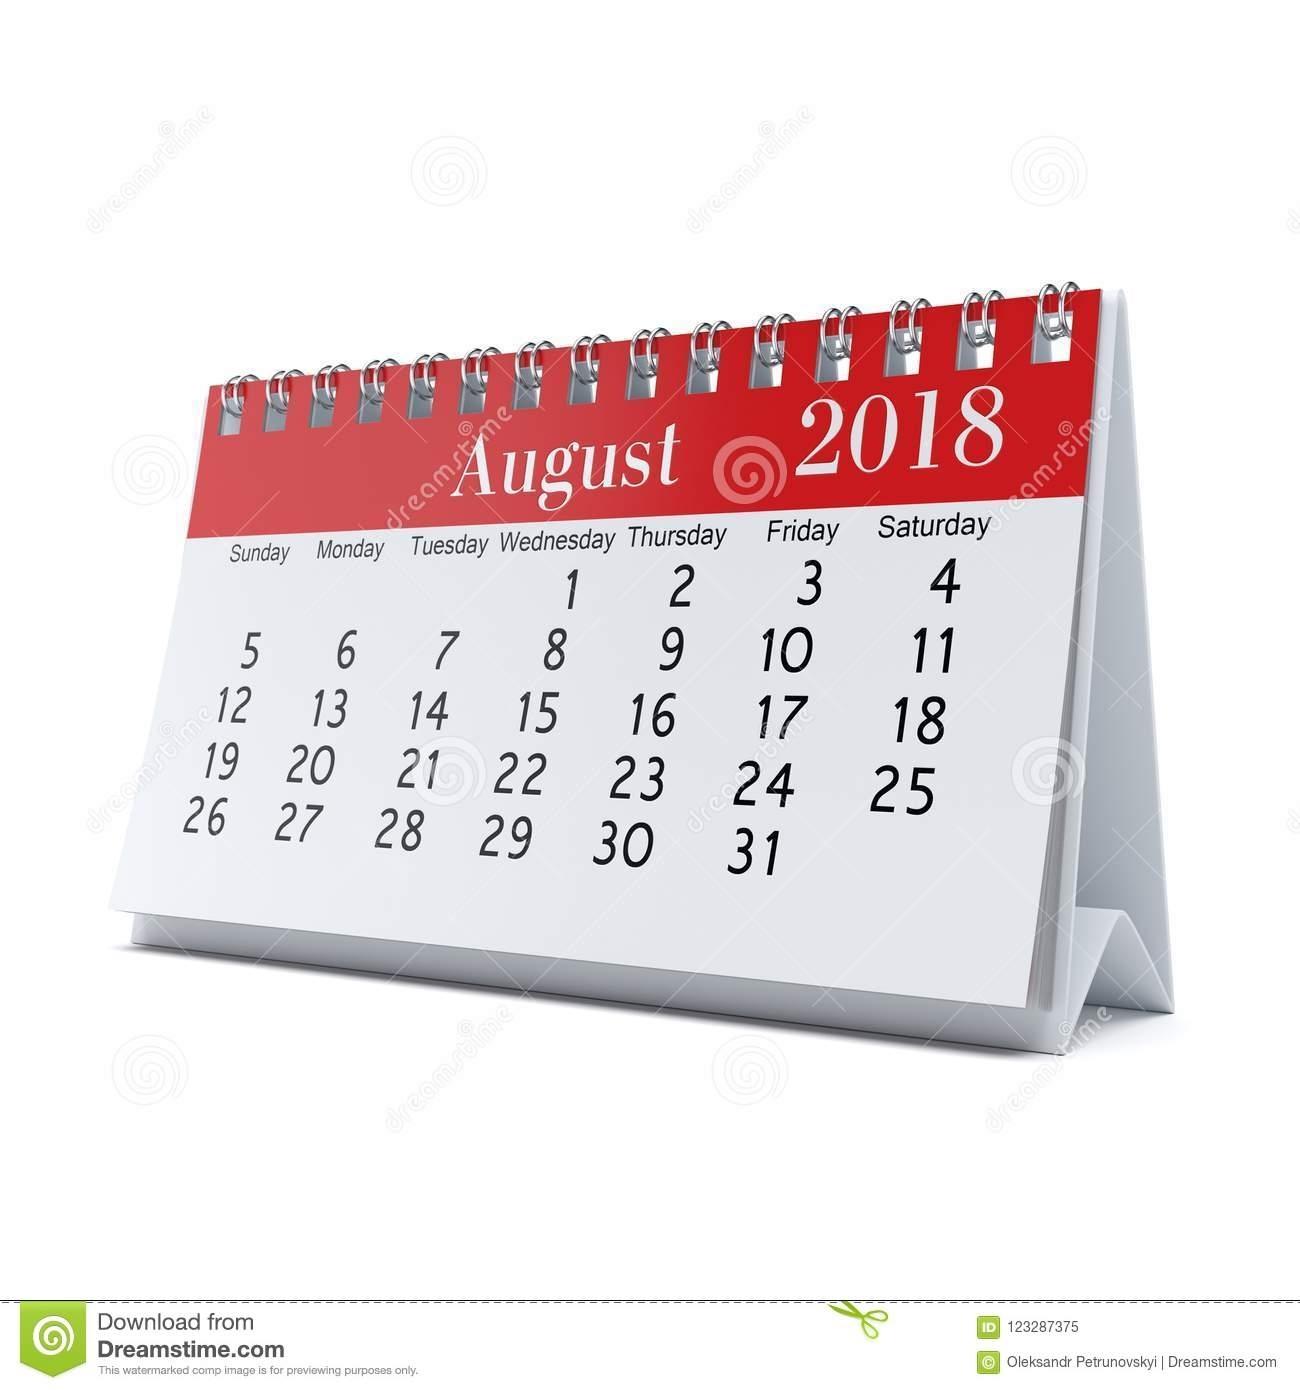 3D Rendering Calendar Stock Illustration. Illustration Of Monthly intended for Desktop Calendar With Lunar Cycle